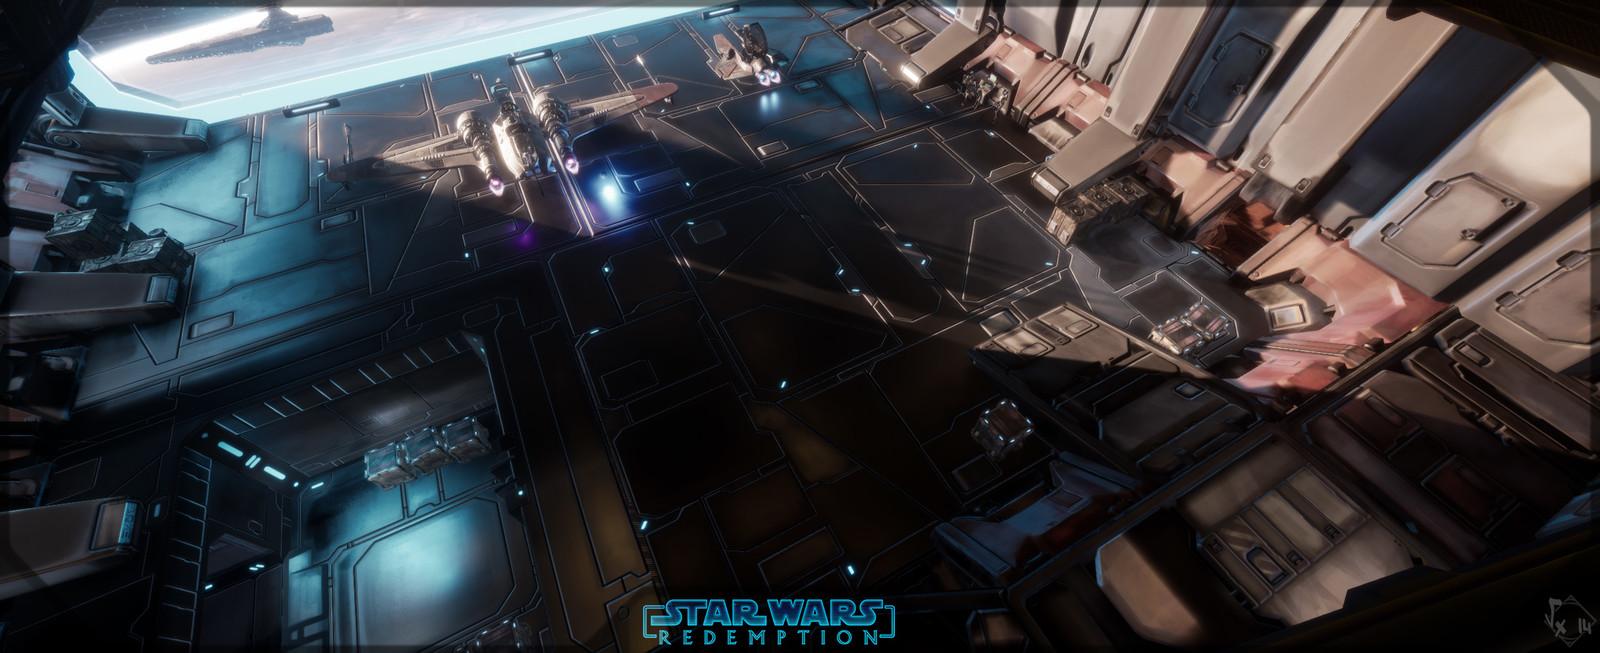 Star Wars - Redemption | Venator Hangars